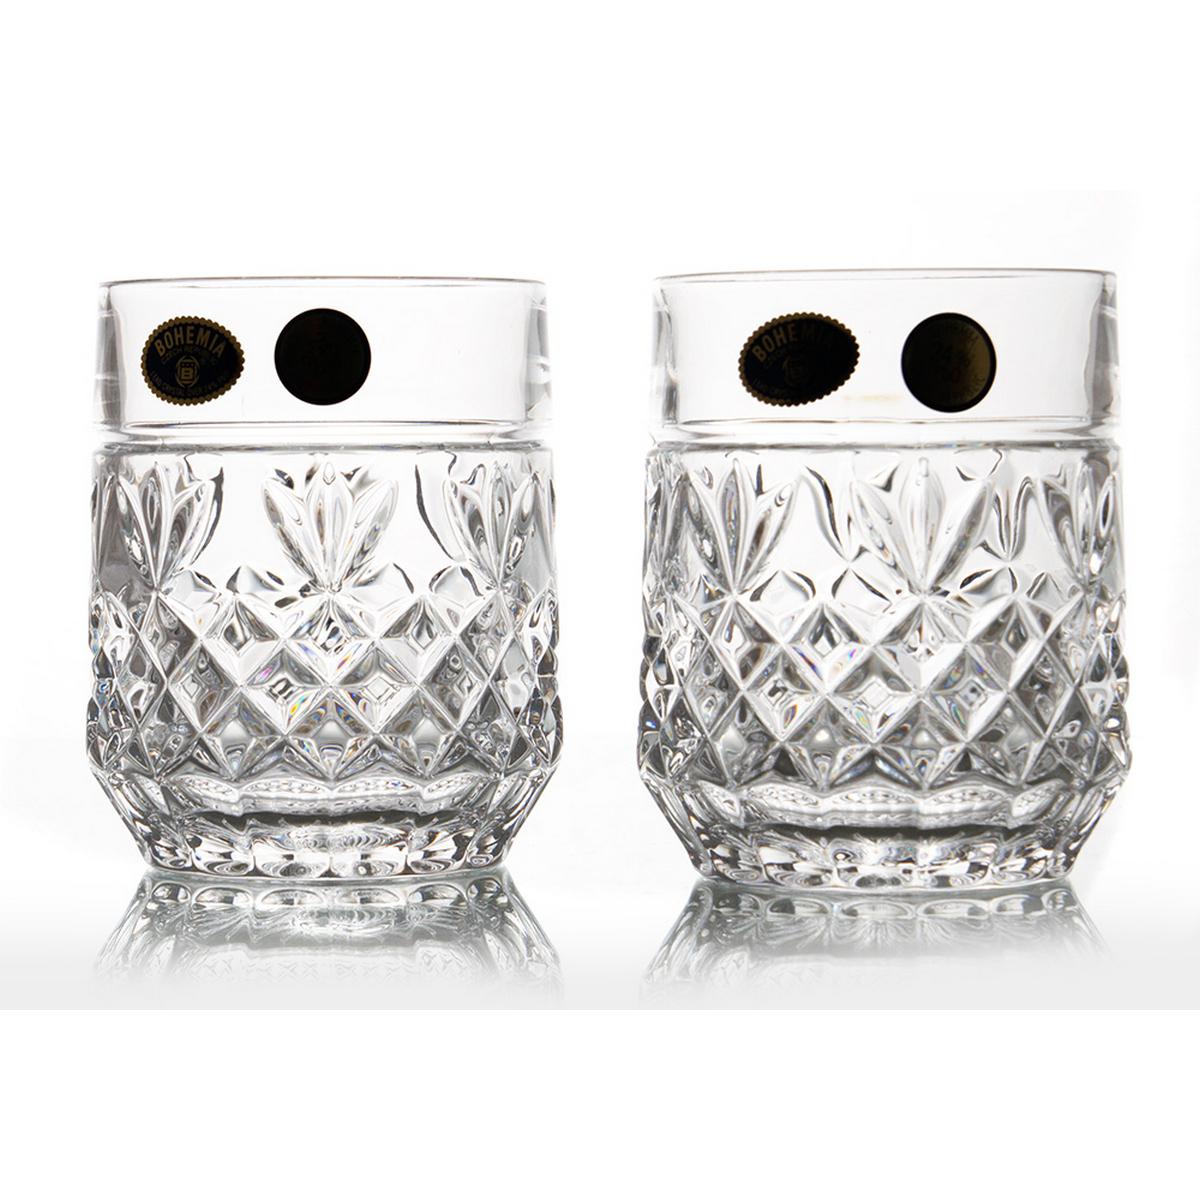 Adidas Set 6 Pahare Cristal Bohemia Whisky 240 Ml 2021 aranjareamesei.ro